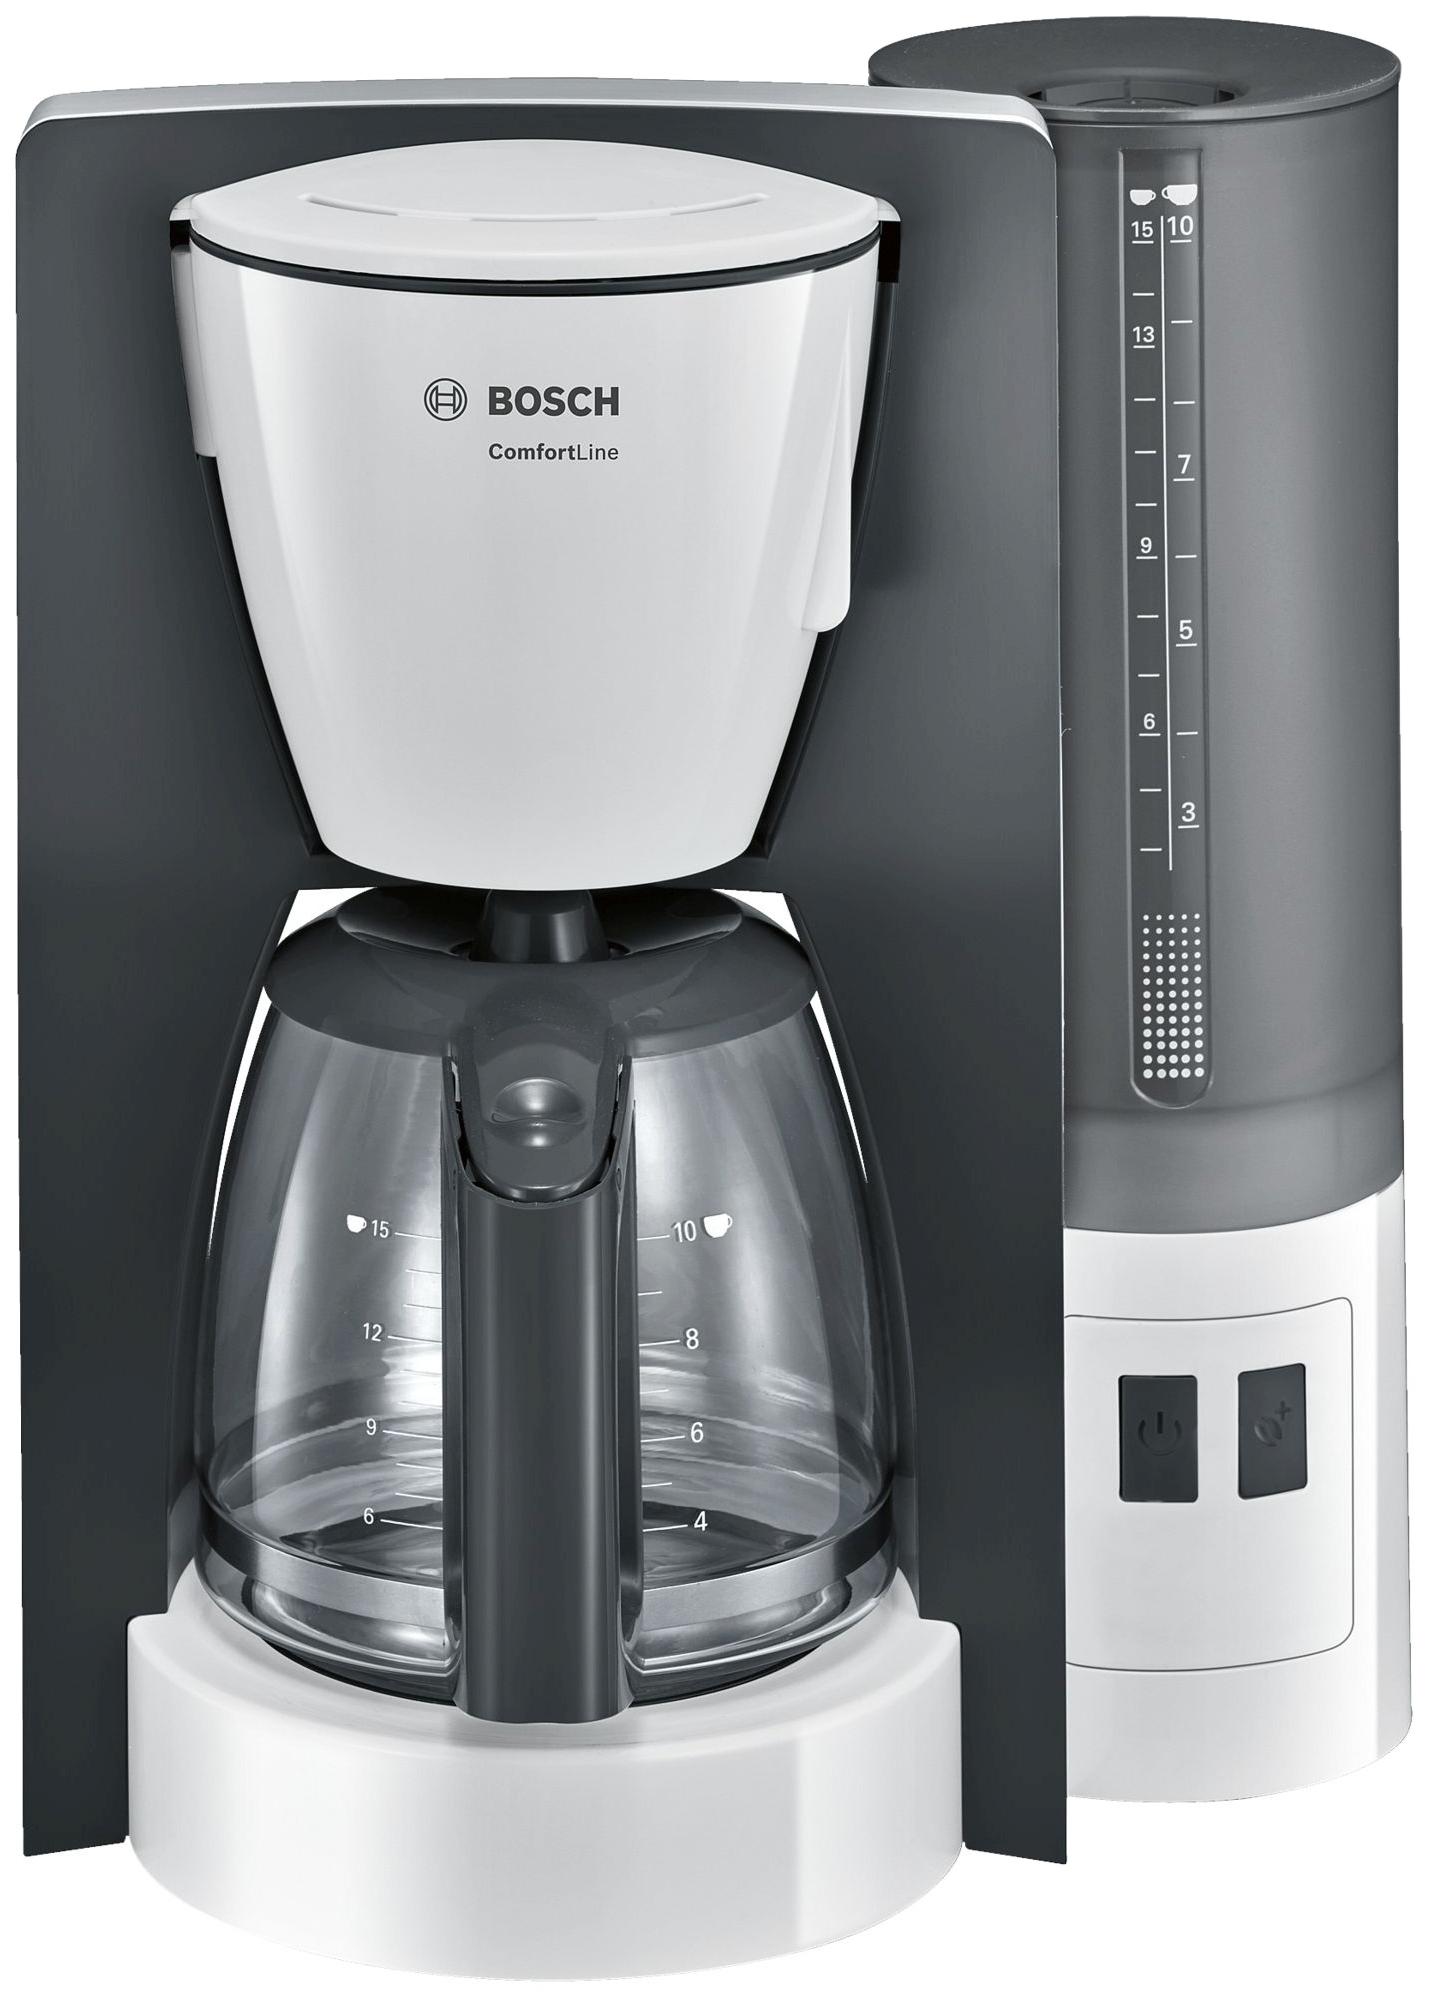 Кофеварка капельного типа Bosch ComfortLine TKA6A041 White фото